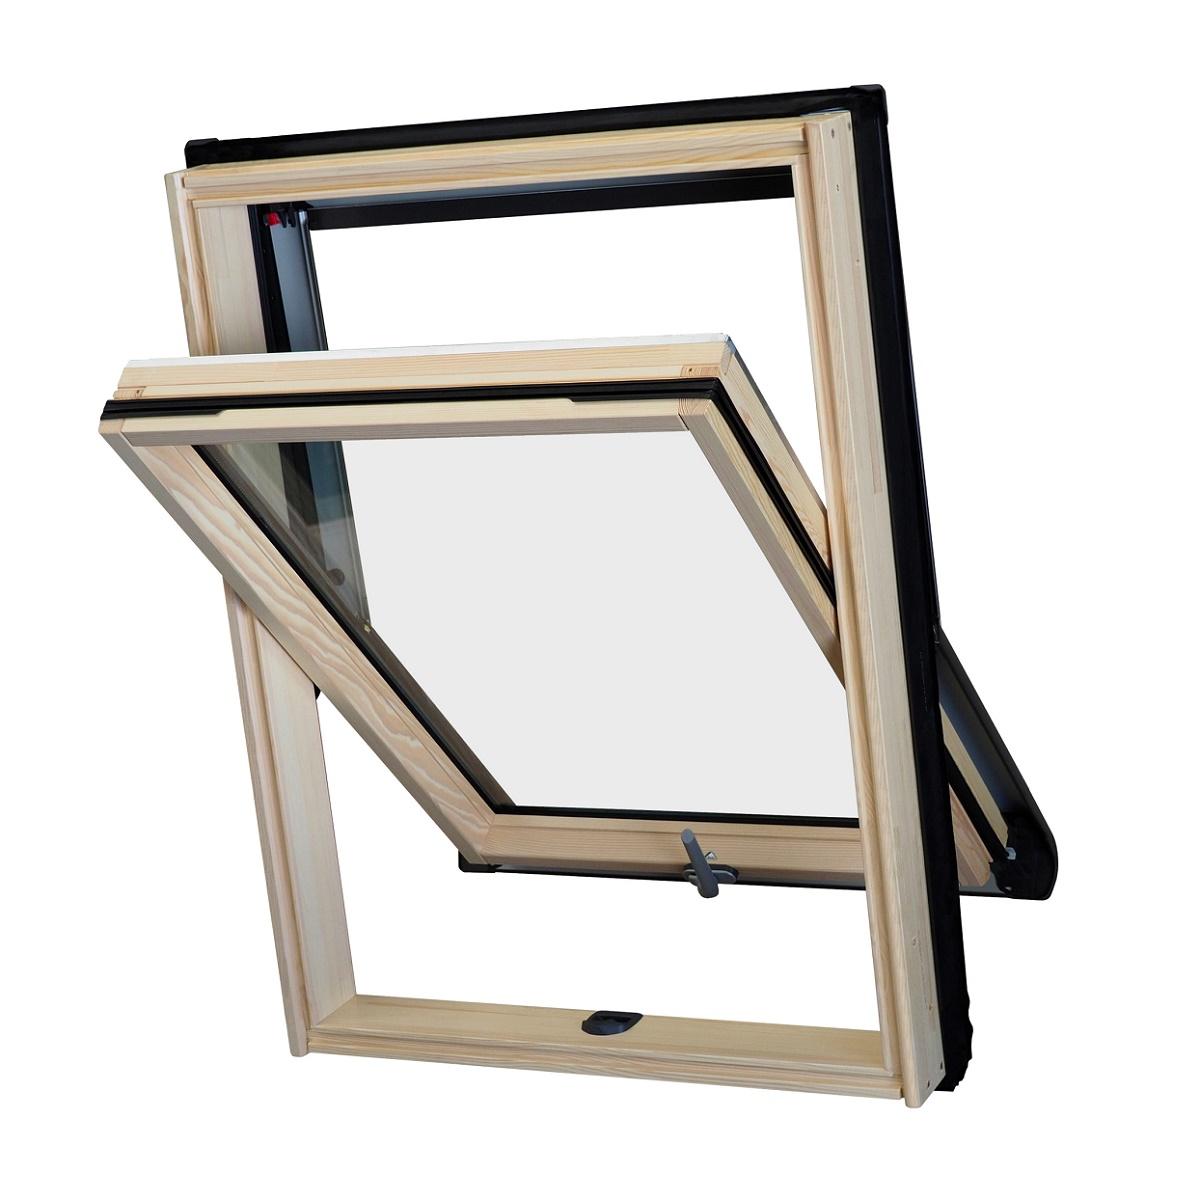 Ventanas Para Tejado Roto Designo R45 Carpinteria Aluminio ~ Cortinas Para Ventanas De Tejado